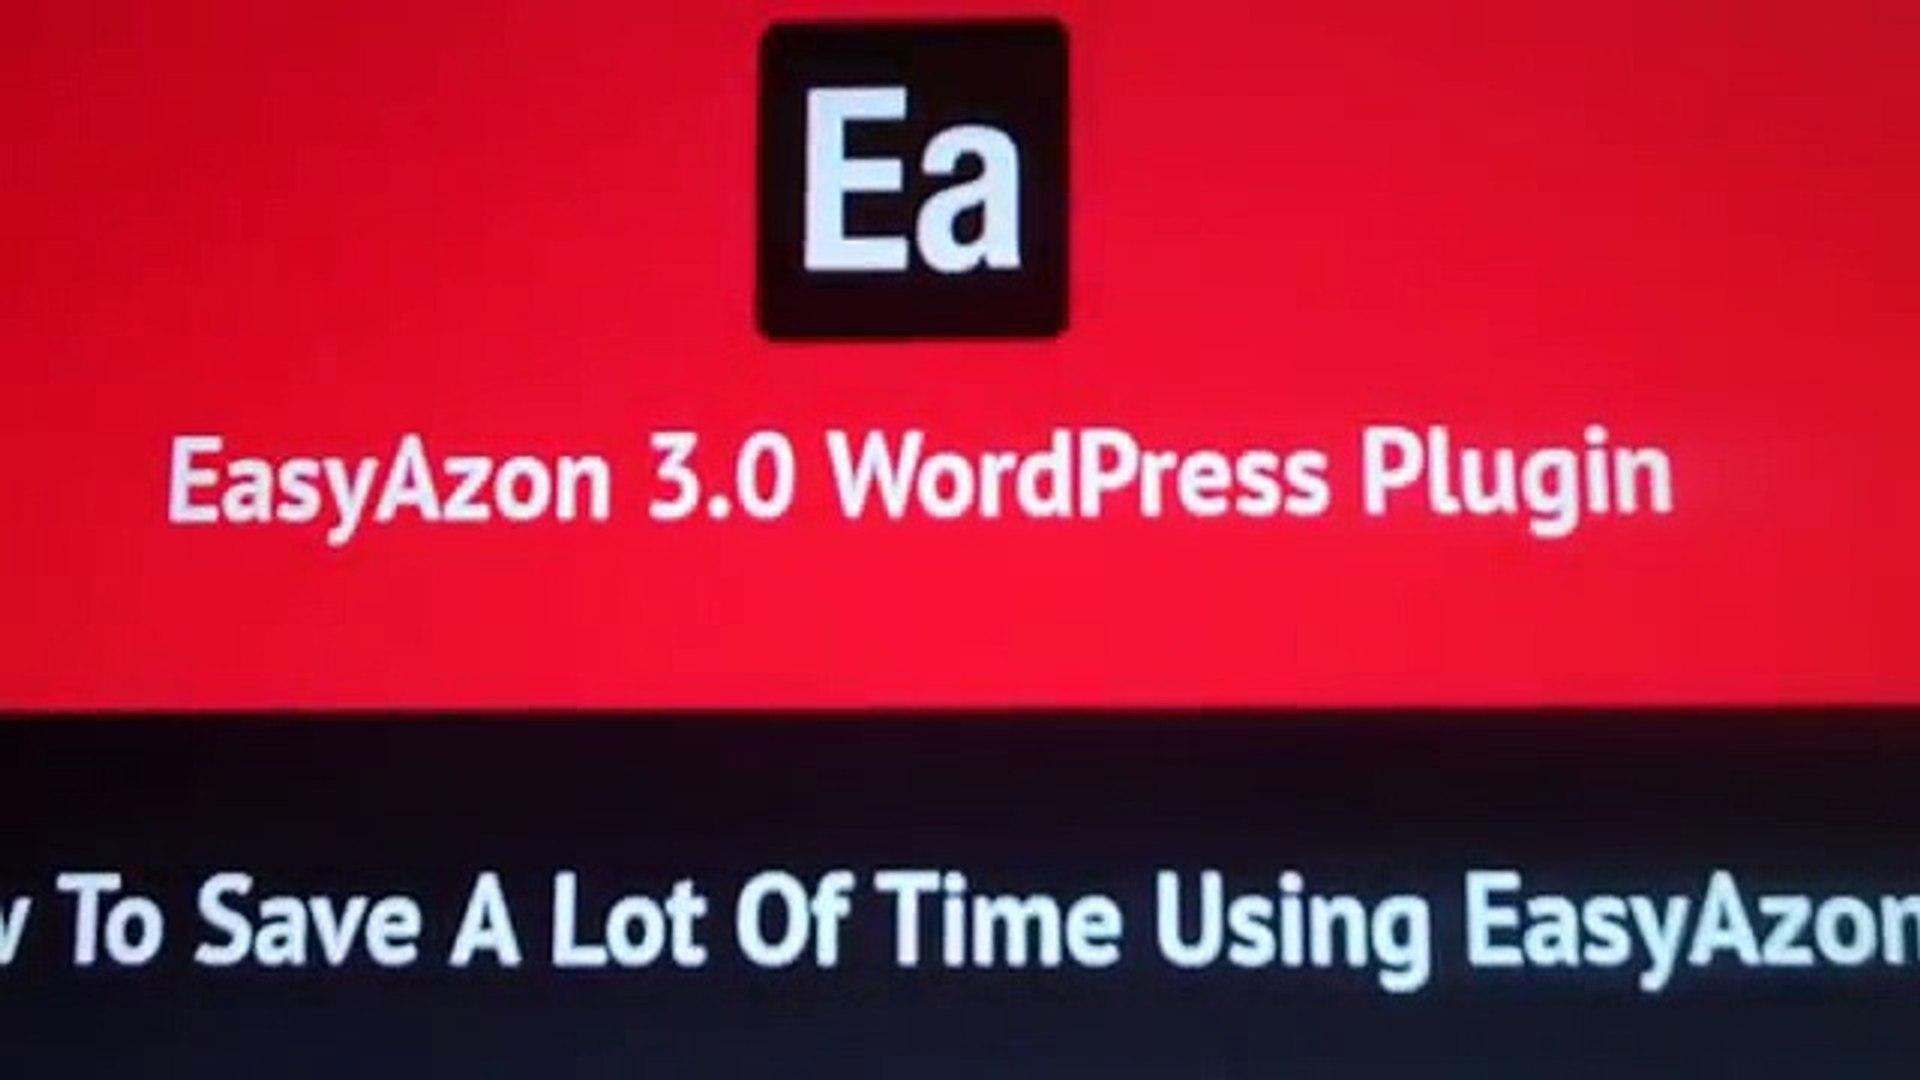 Easy Azon 3.0 - Amazon Affiliate Link Profits